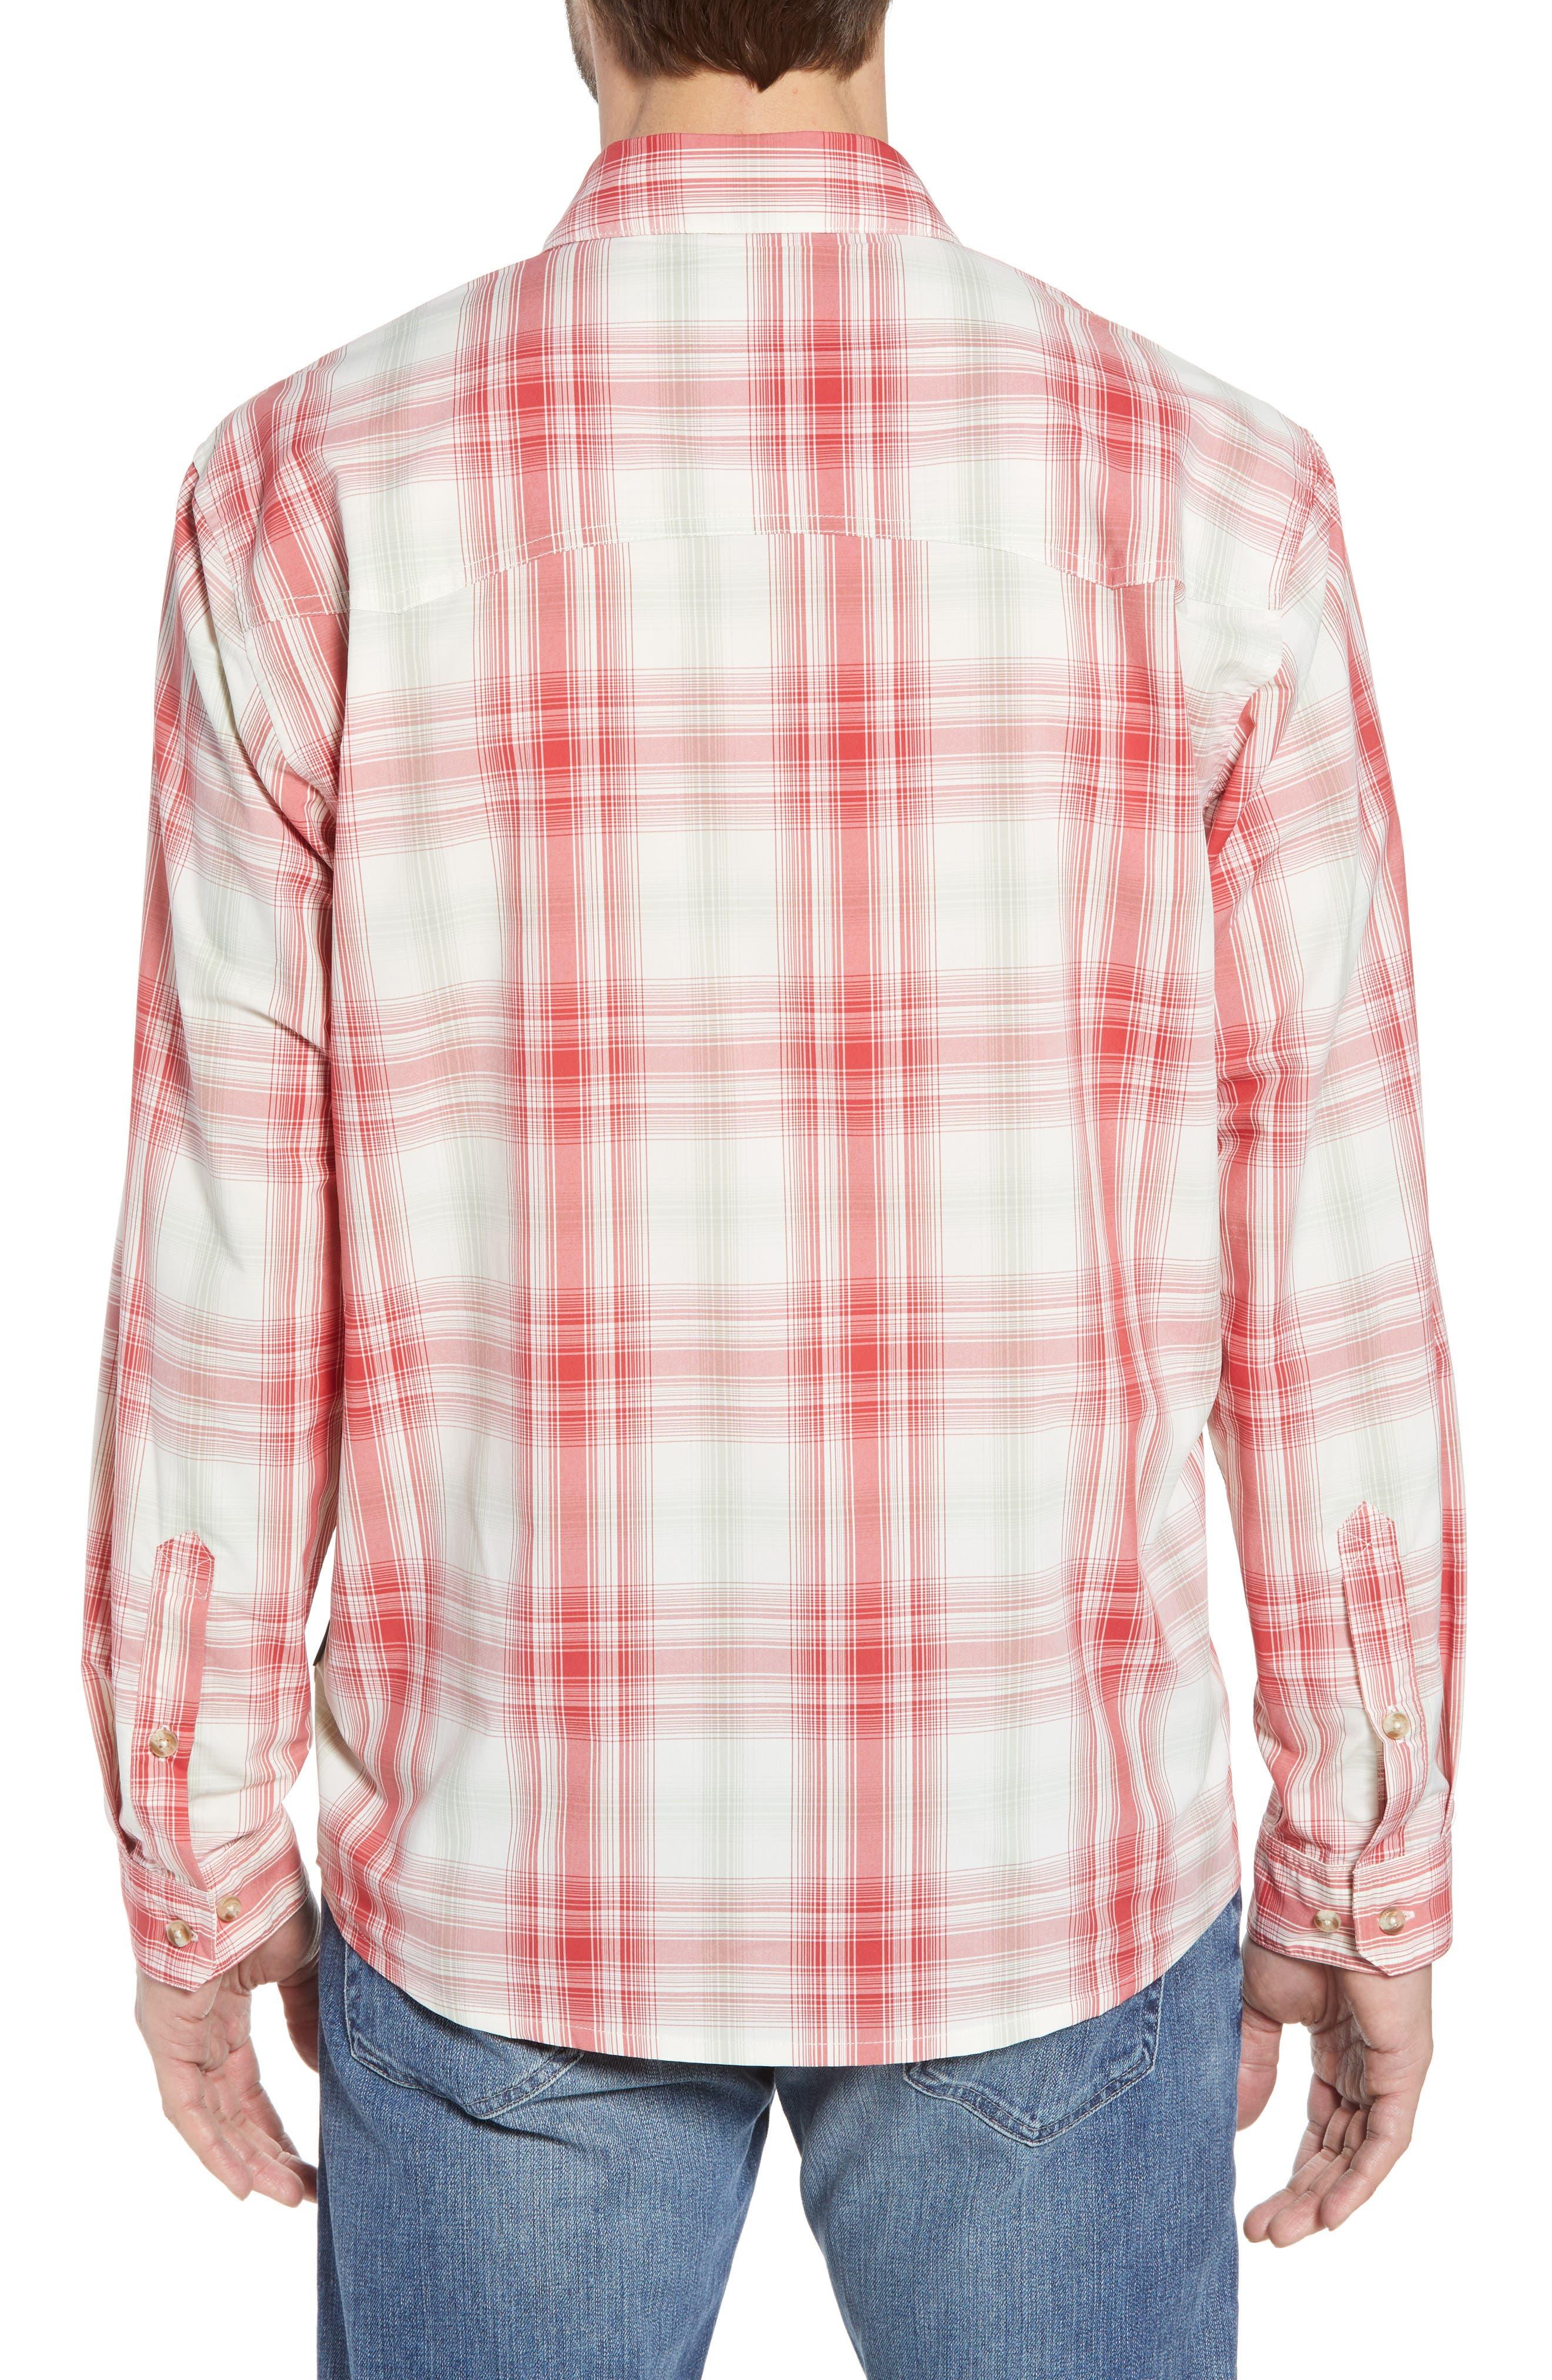 Regular Fit Plaid Sport Shirt,                             Alternate thumbnail 3, color,                             King Swing/ Static Red